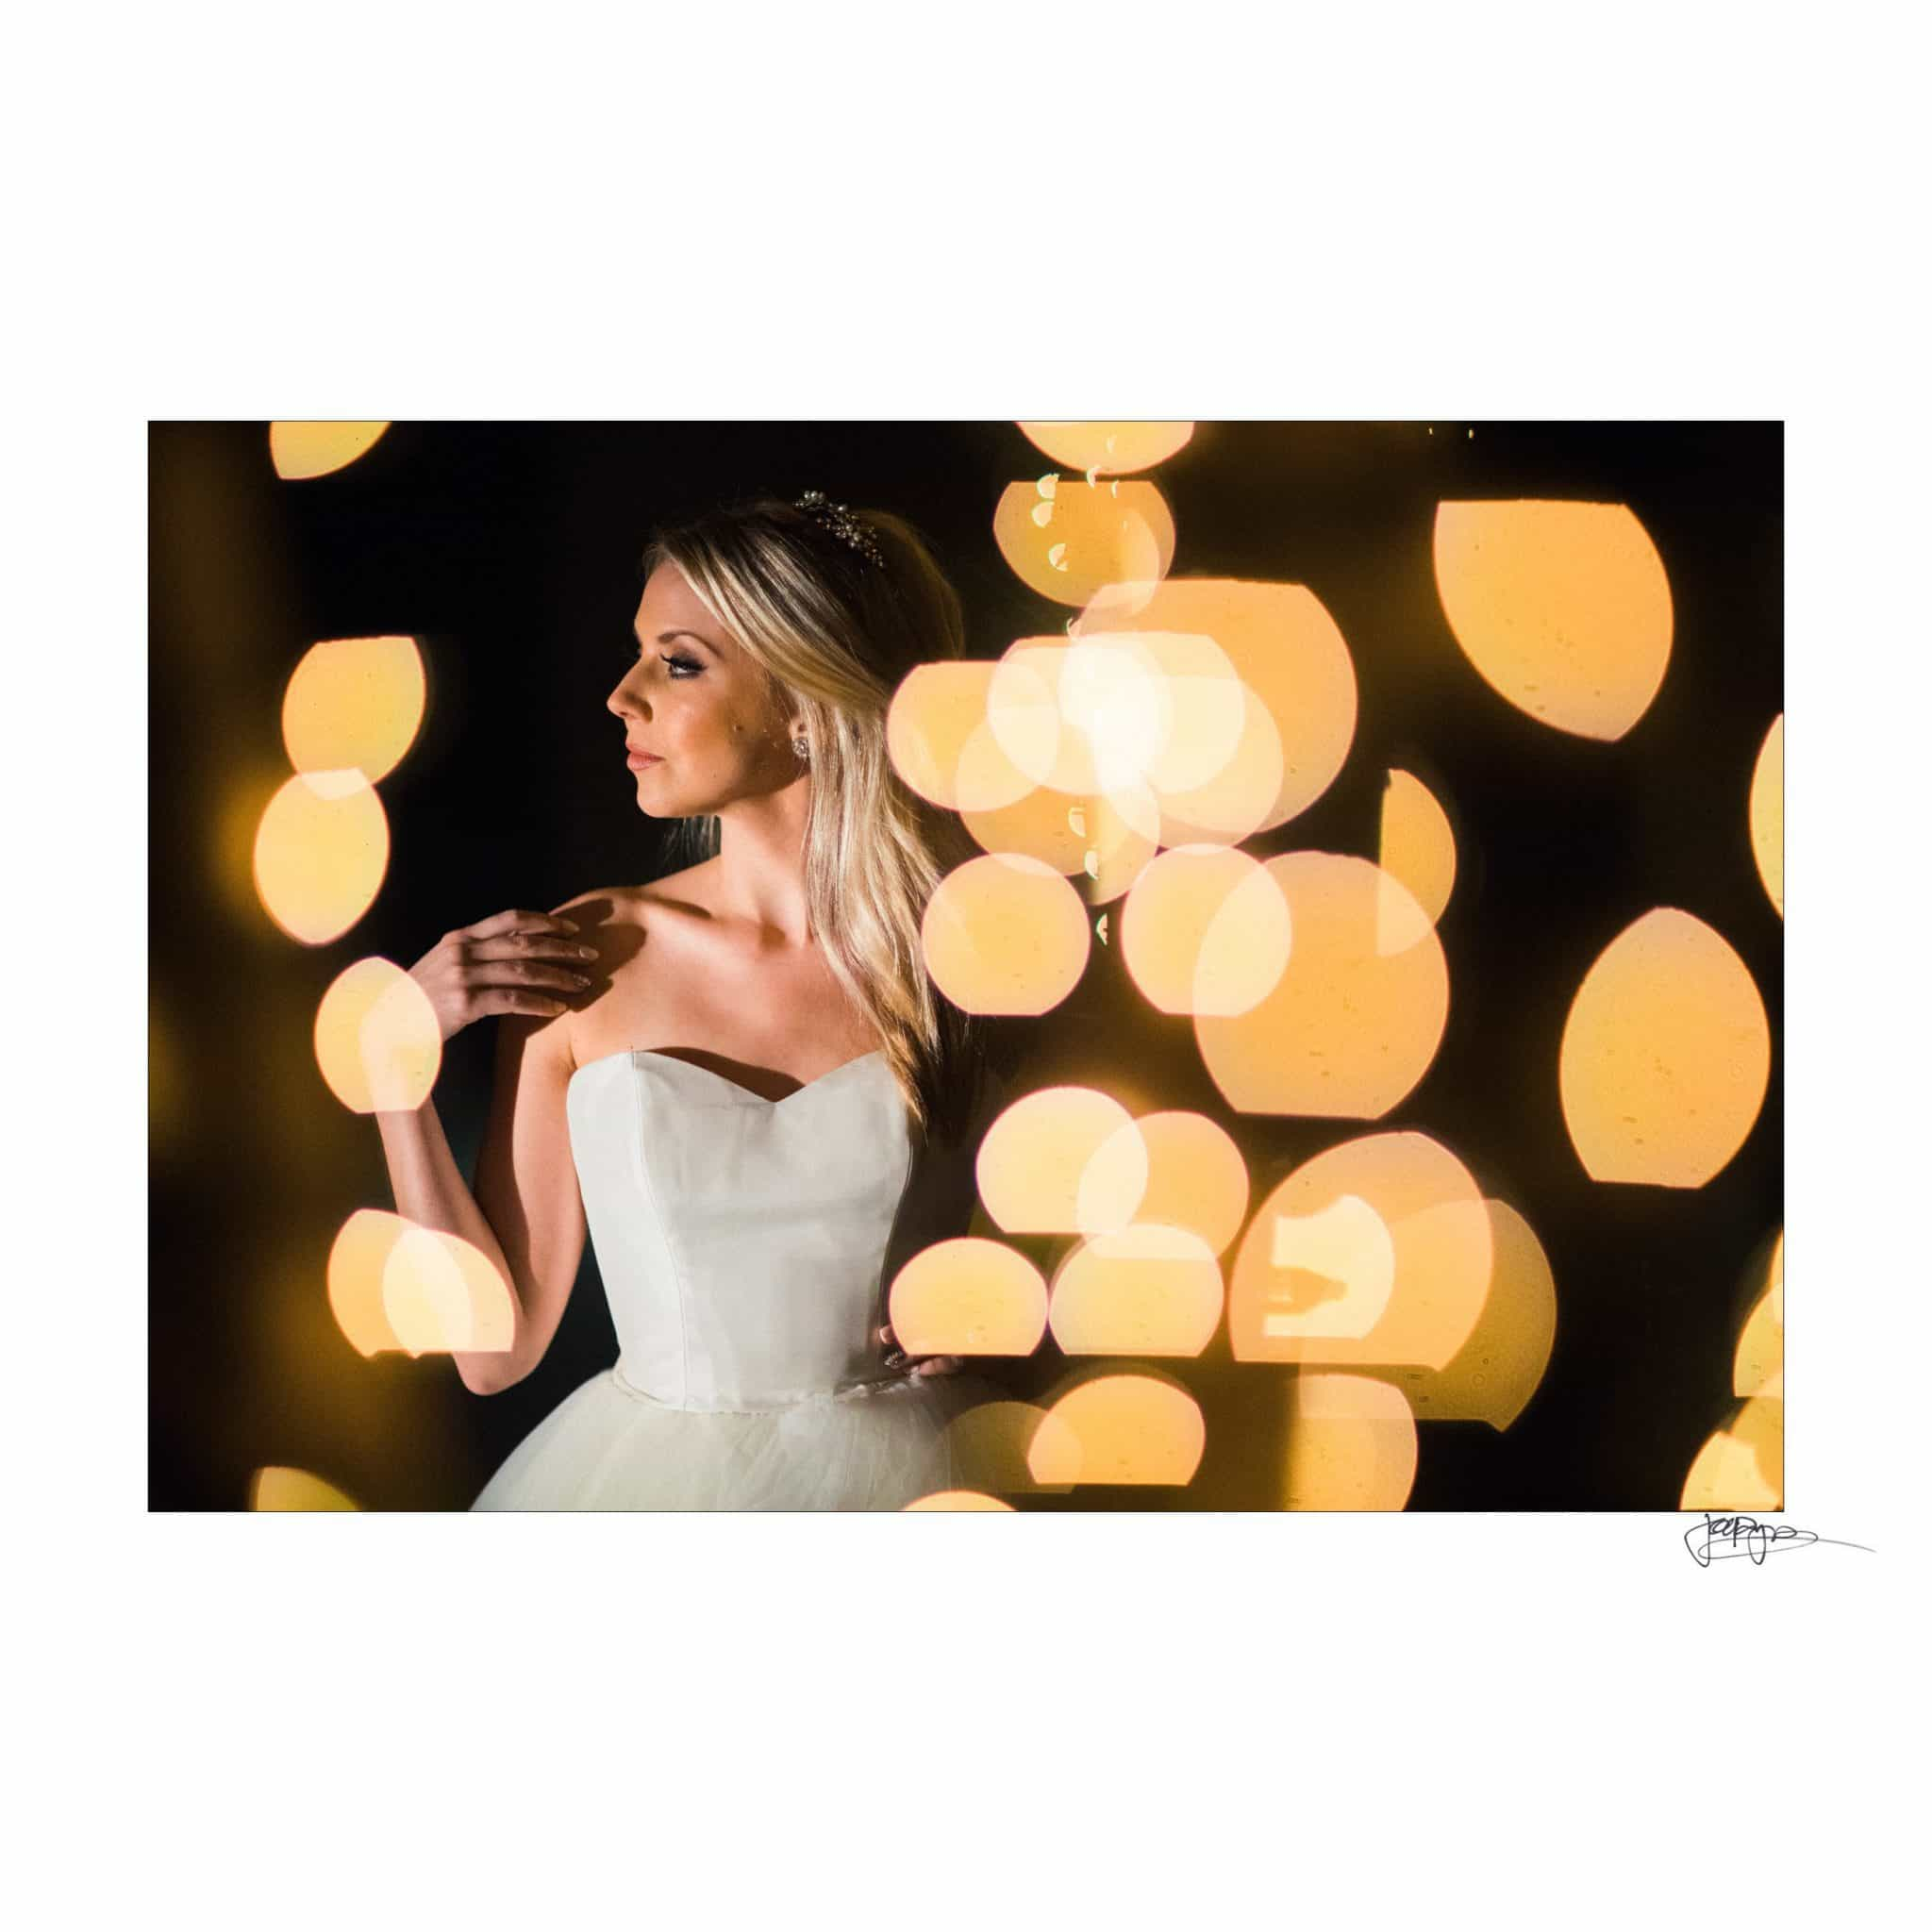 Umstead Hotel Wedding Bride in Lights